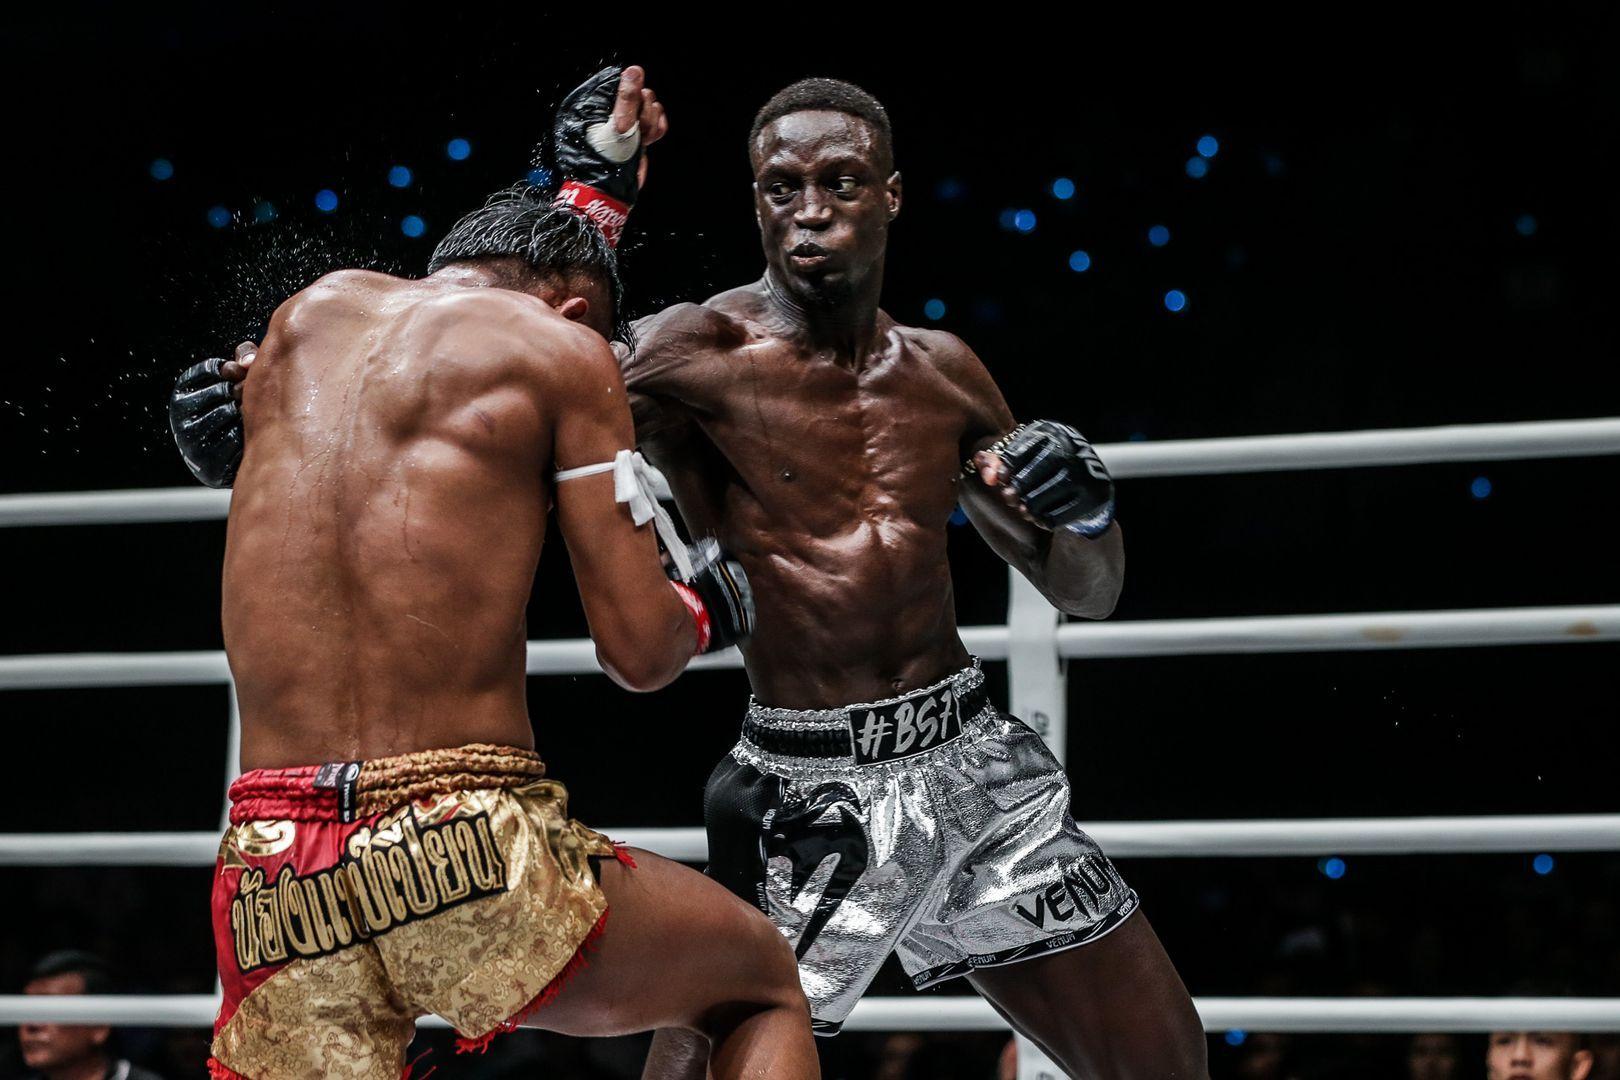 Bobo Sacko attacks Kulabdam with an elbow